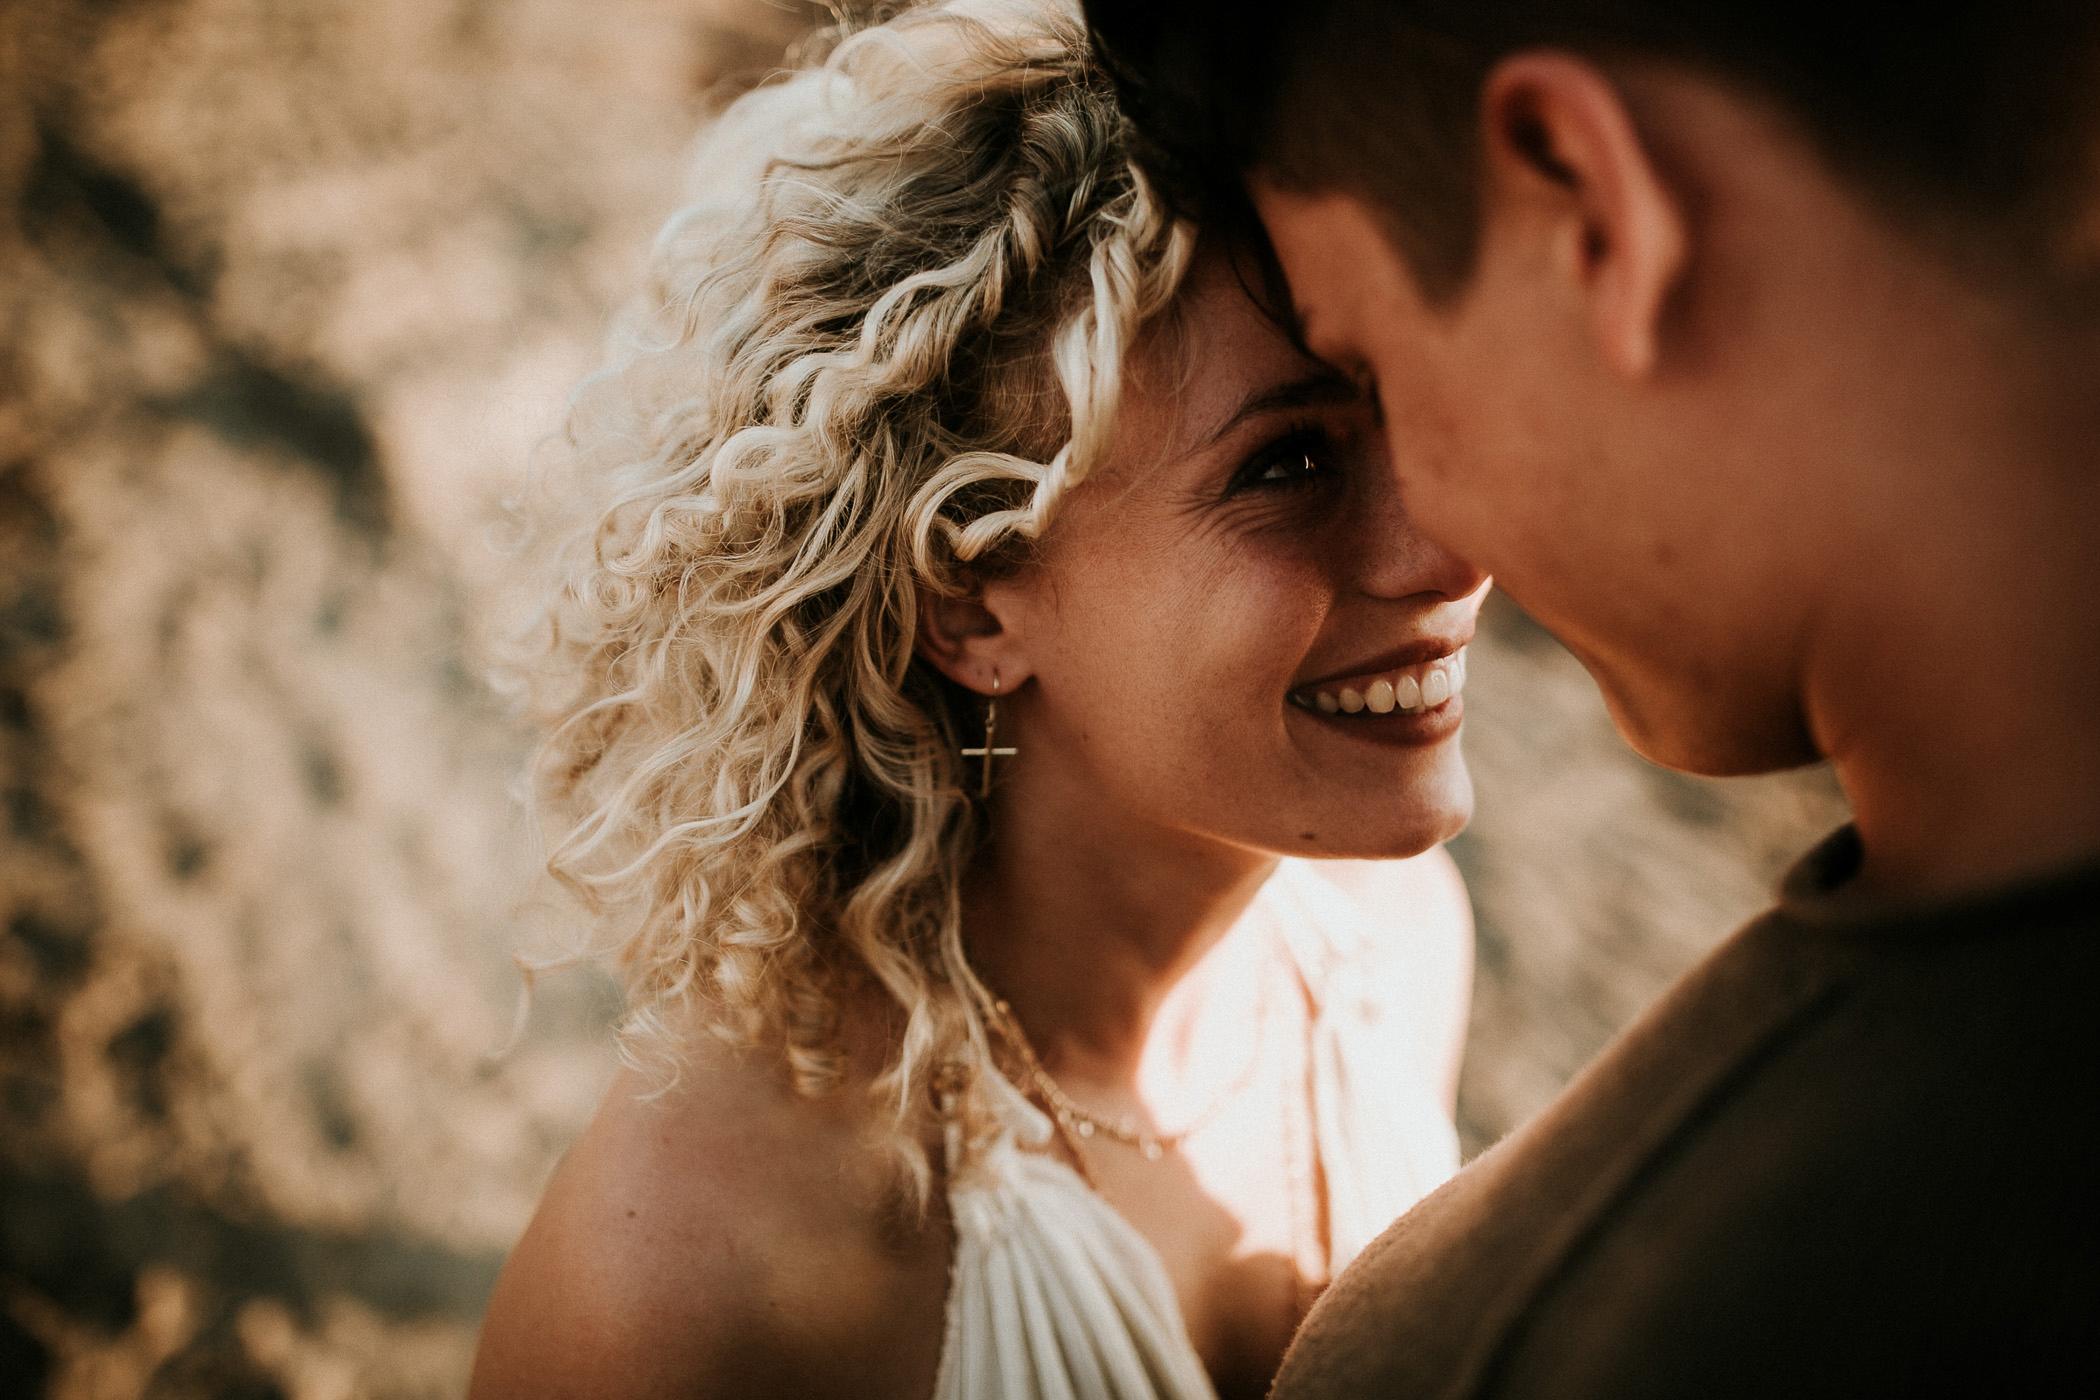 DanielaMarquardtPhotography_elopement_mallorca_spain_paguera_palma_charlyandbela_90